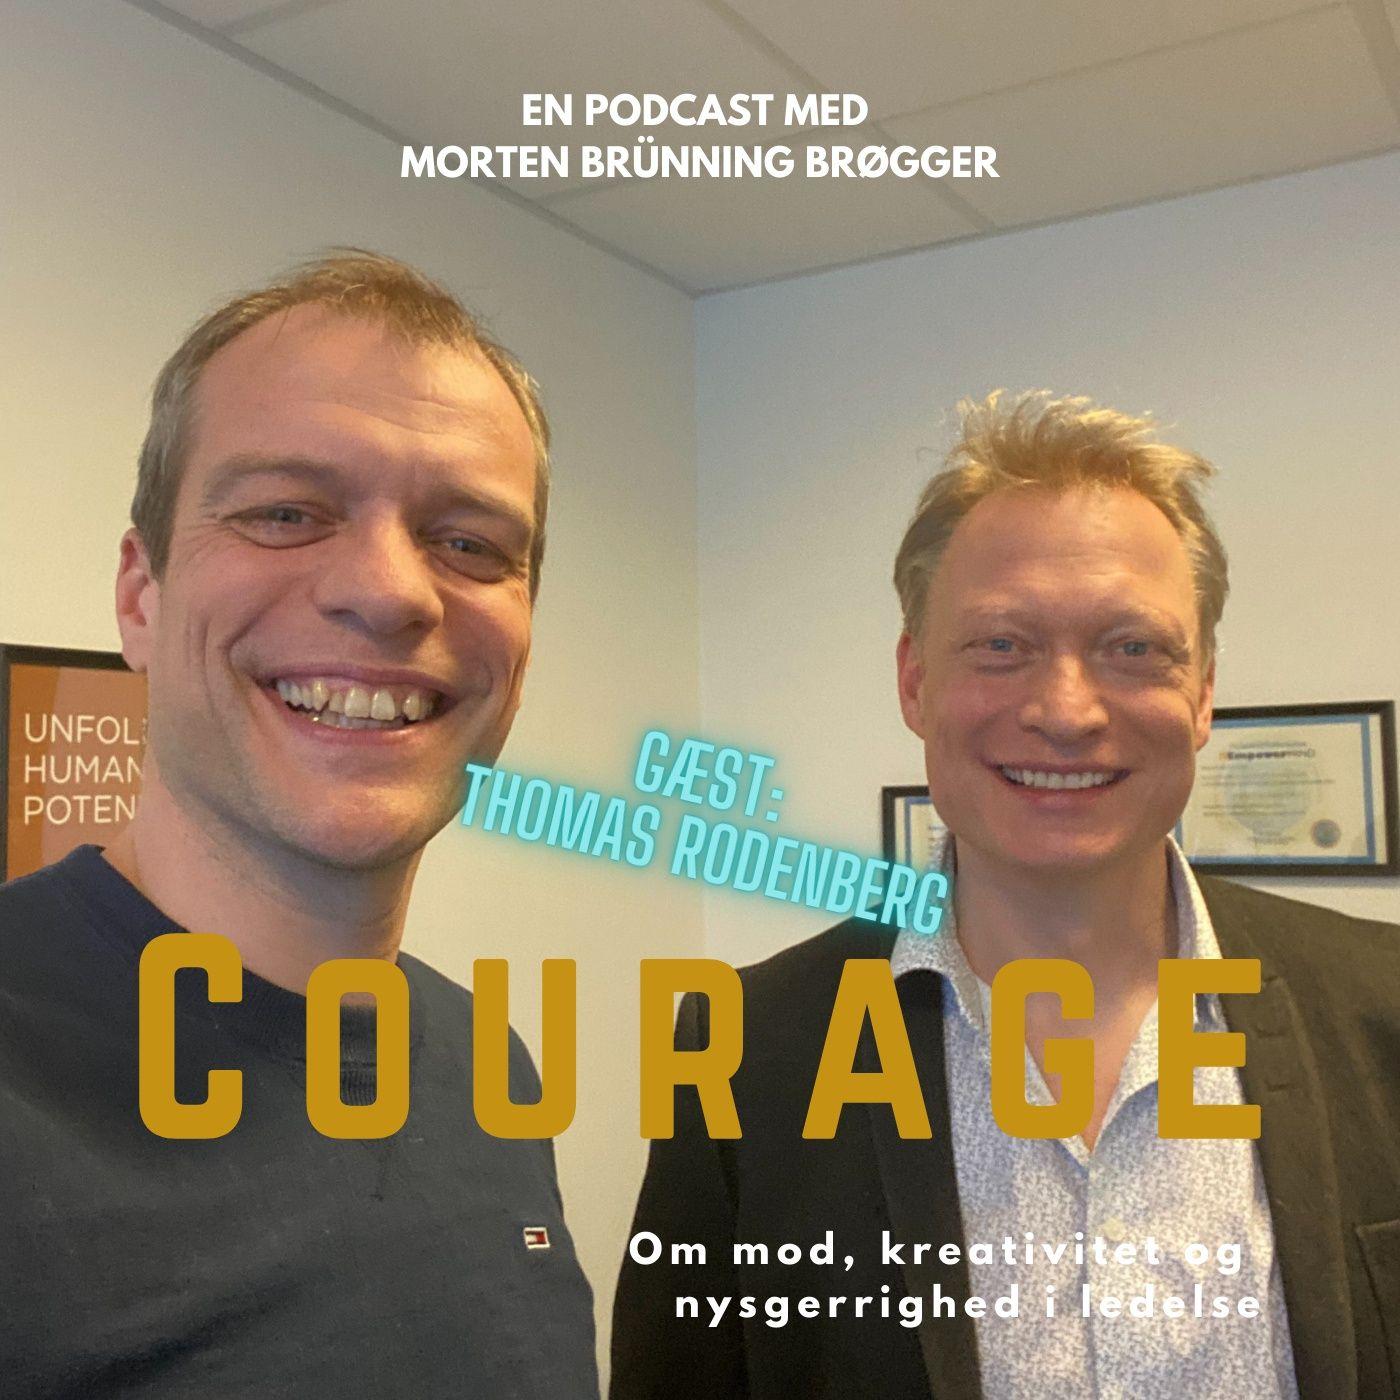 Courage 21 - Thomas Rodenberg